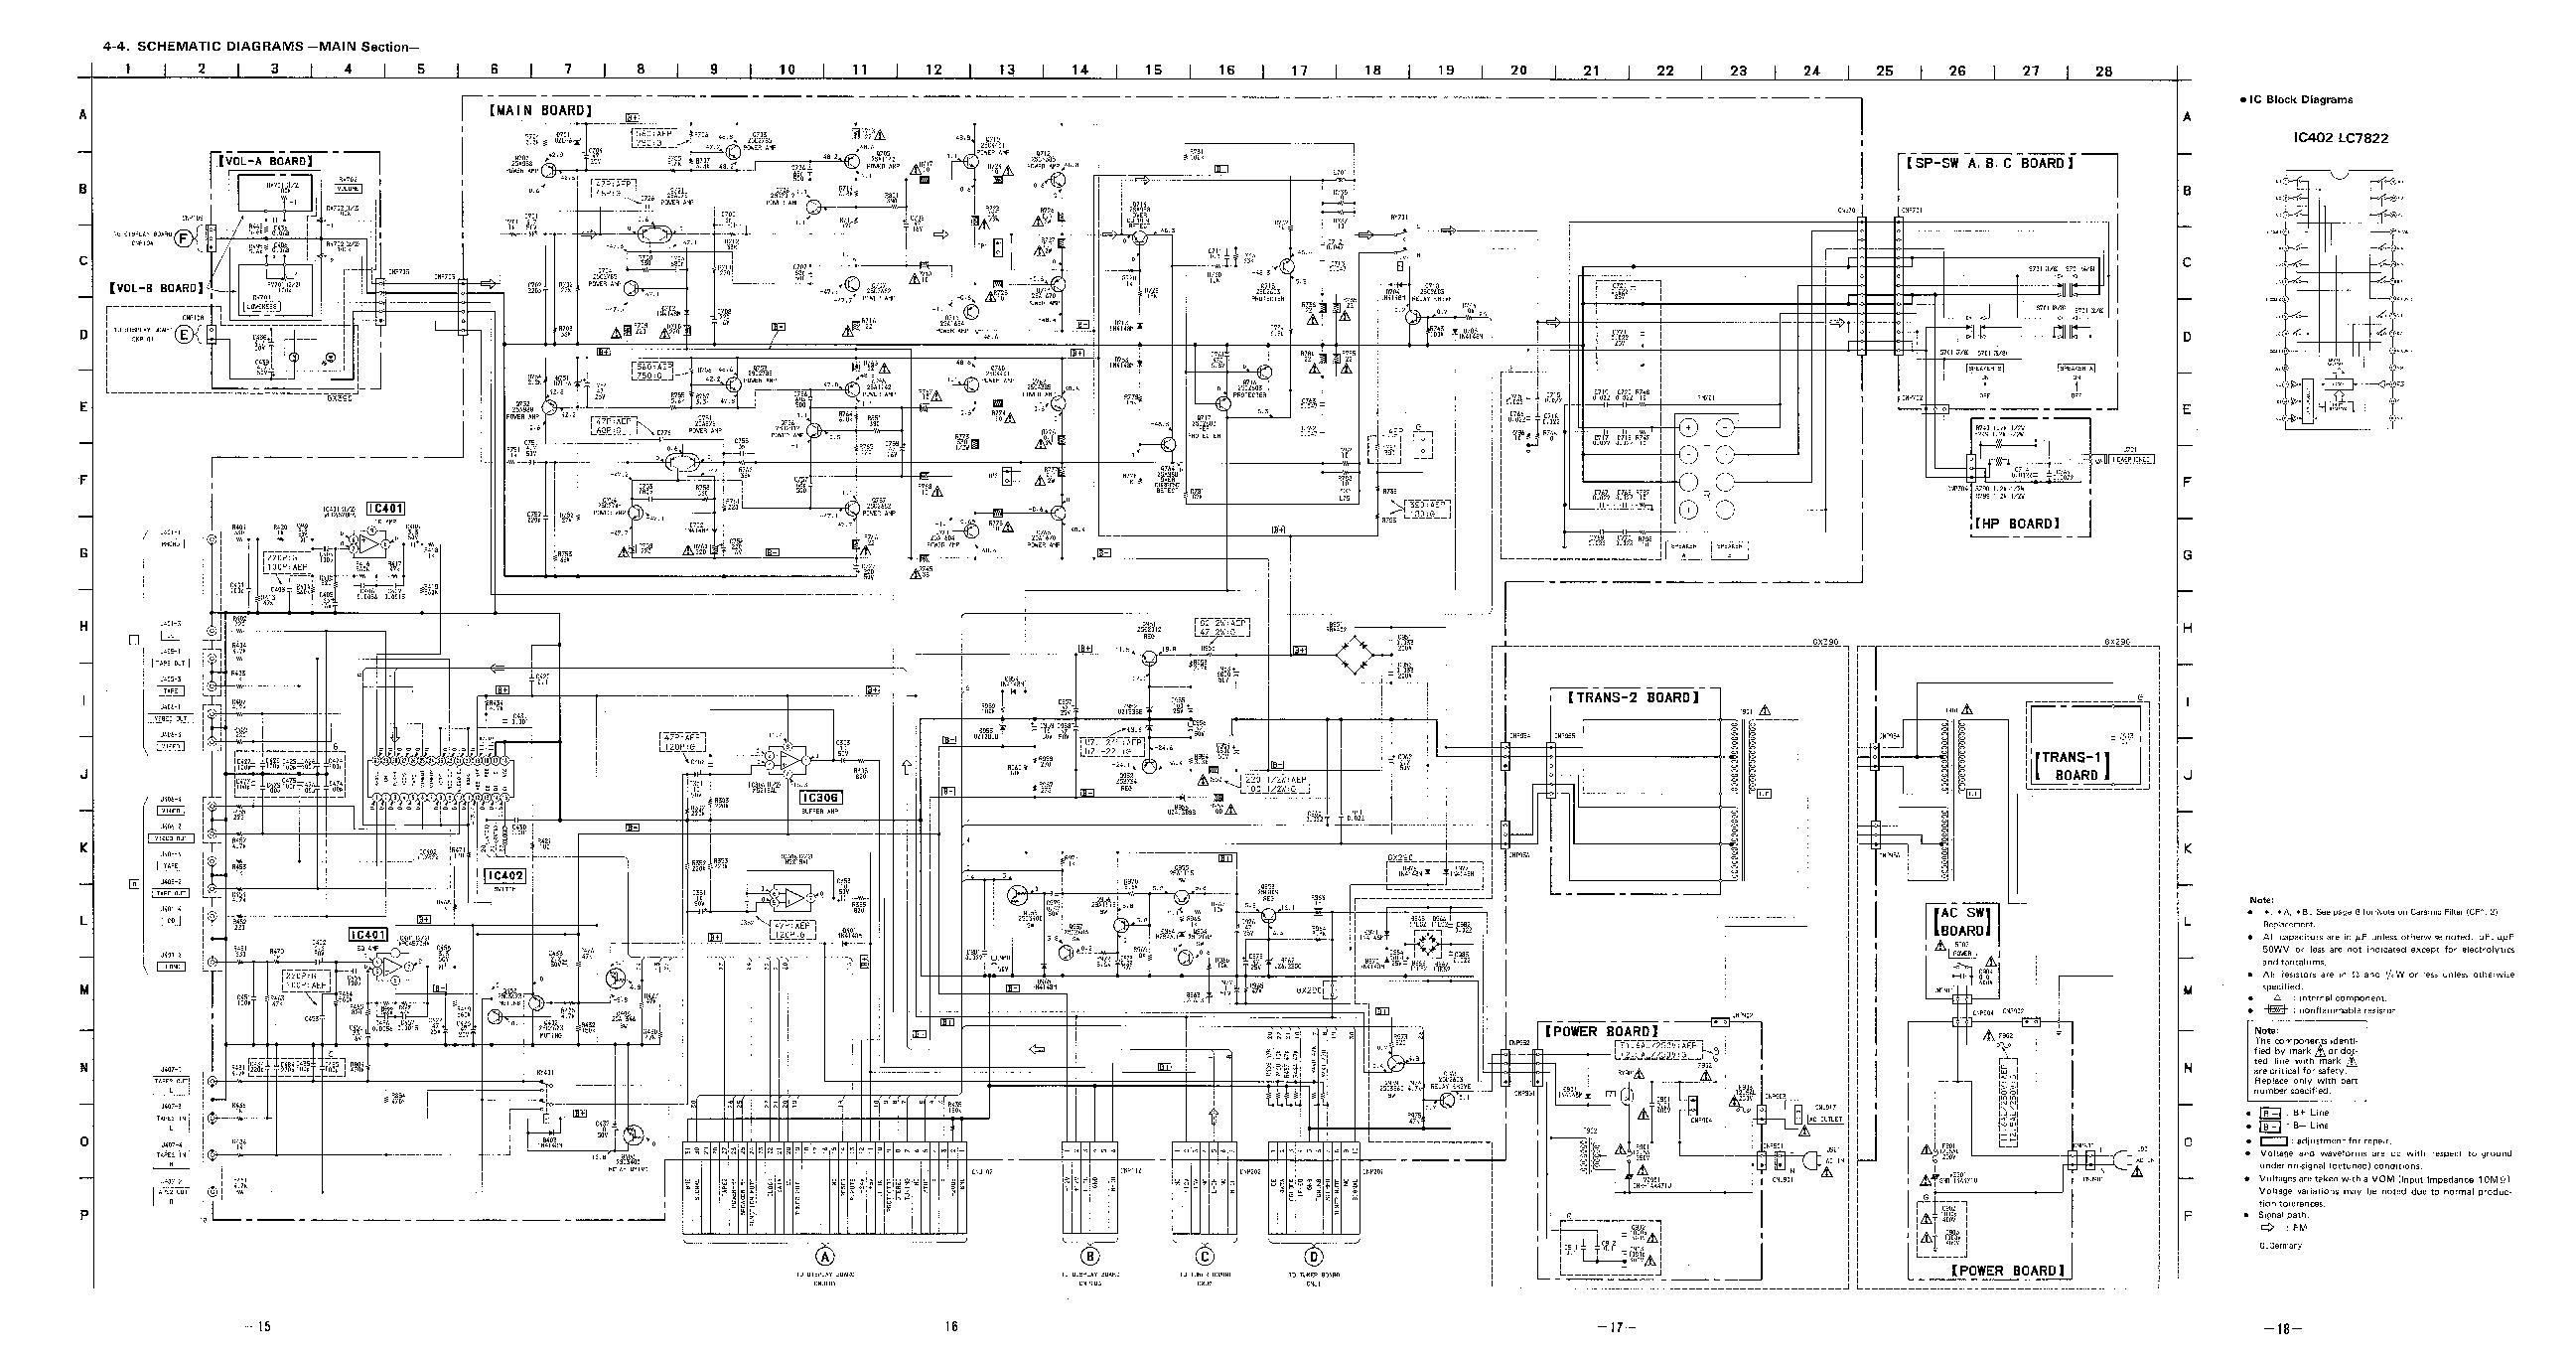 Honda Gx390 Schematic Great Design Of Wiring Diagram Gx 390 Gx270 Manual Free Download Engine